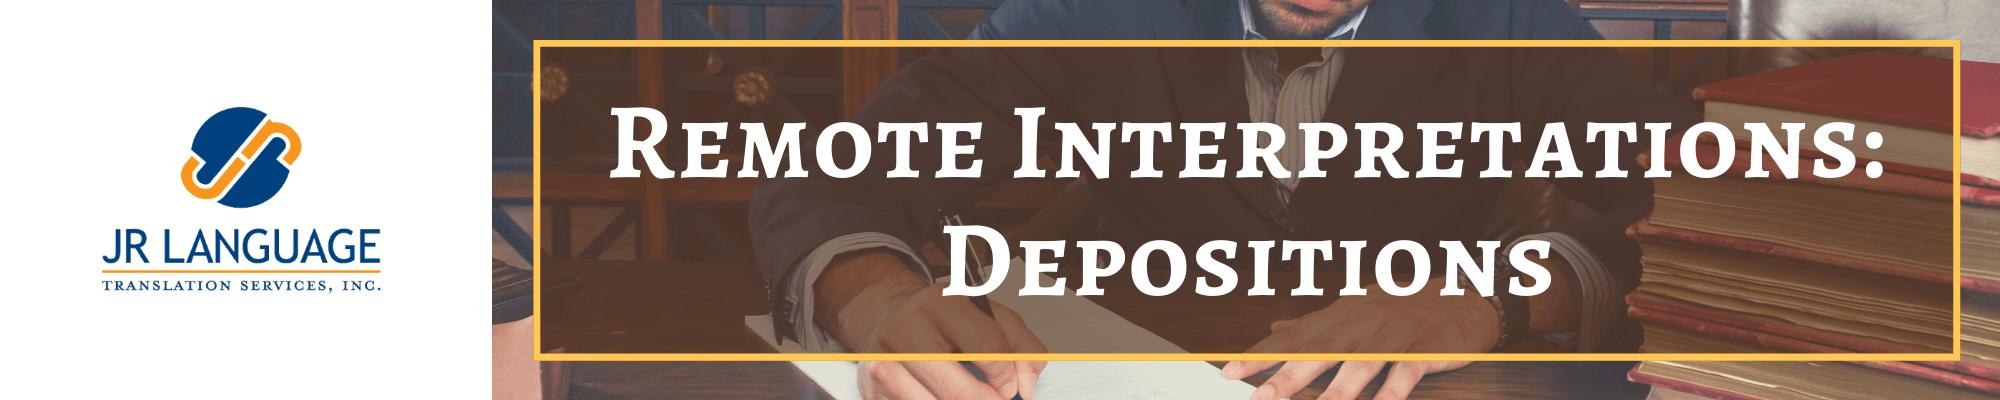 remote interpretation for depositions